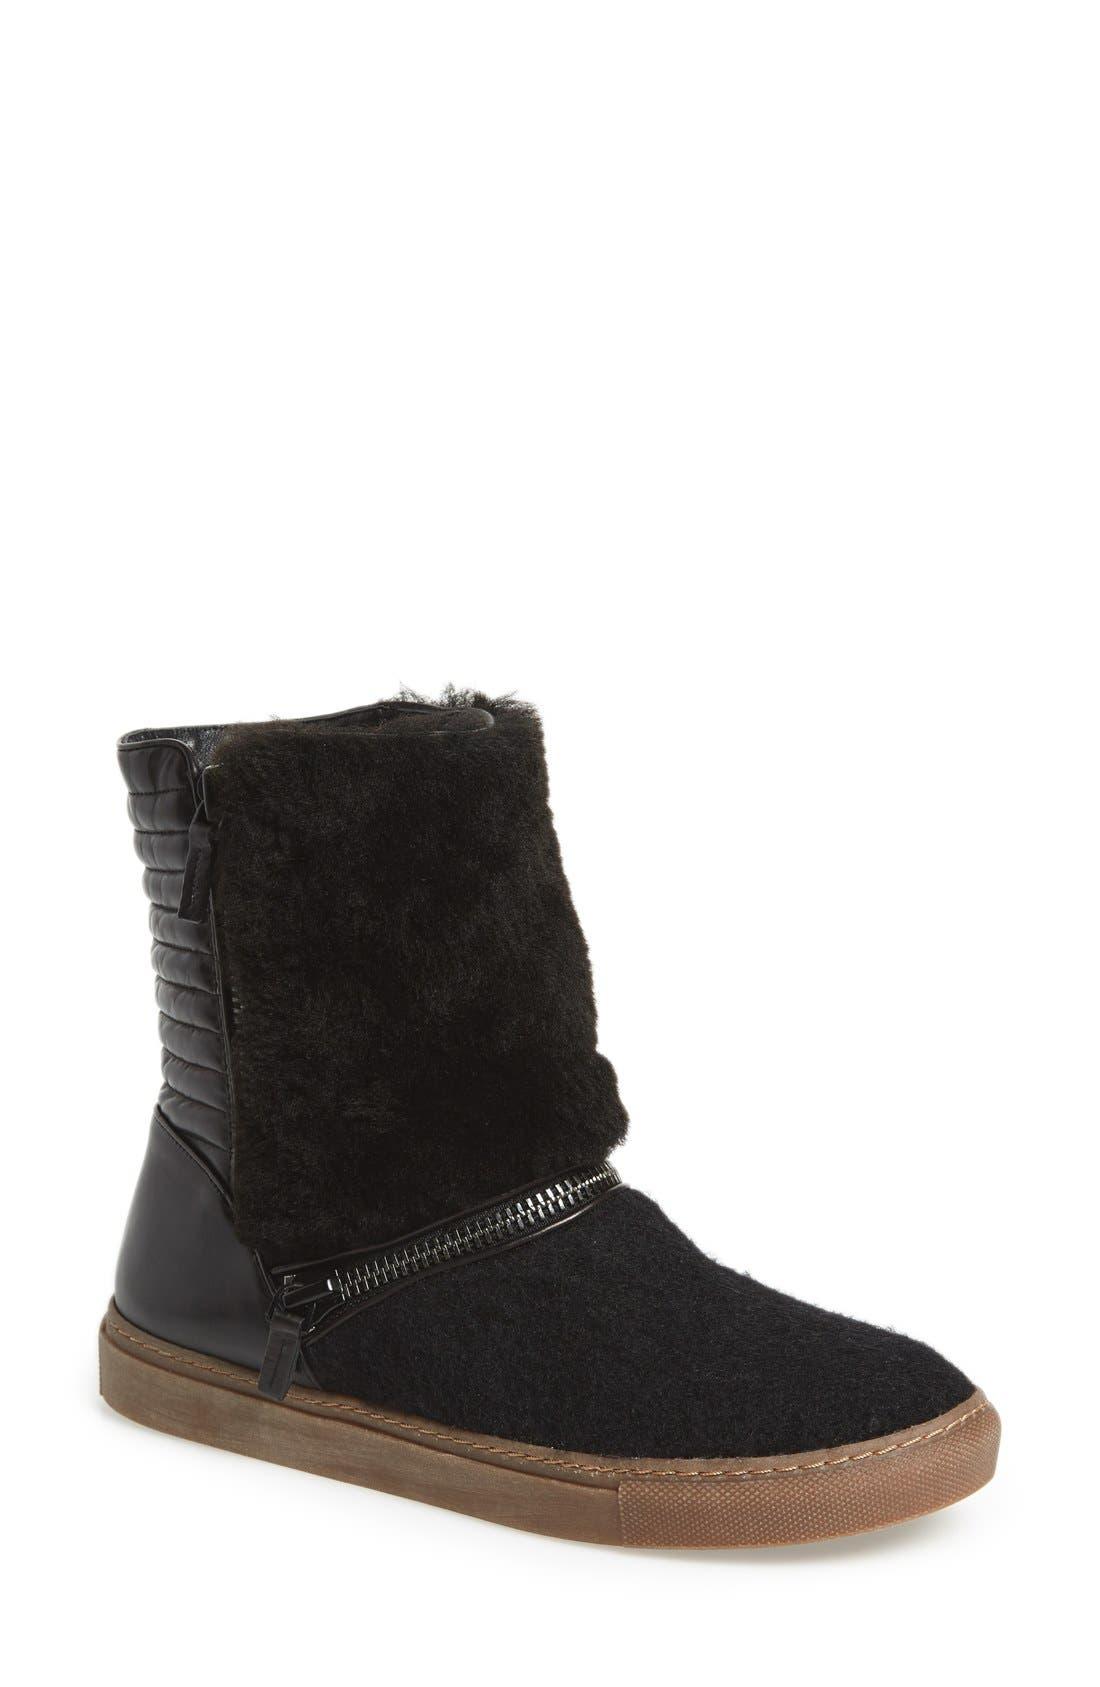 Alternate Image 1 Selected - ElieTahari'Vala' Boot (Women)